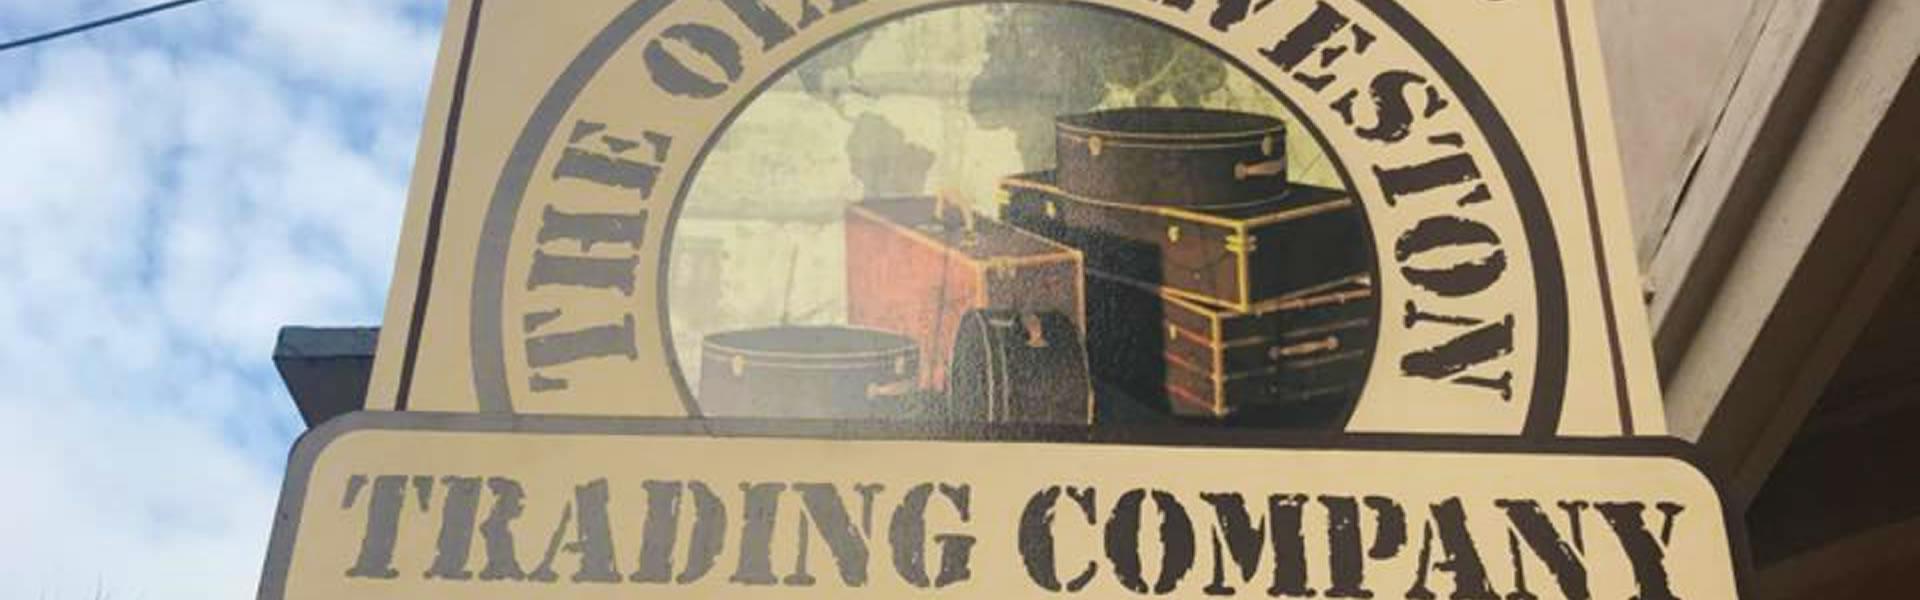 The Old Galveston Trading Company, Galveston TX